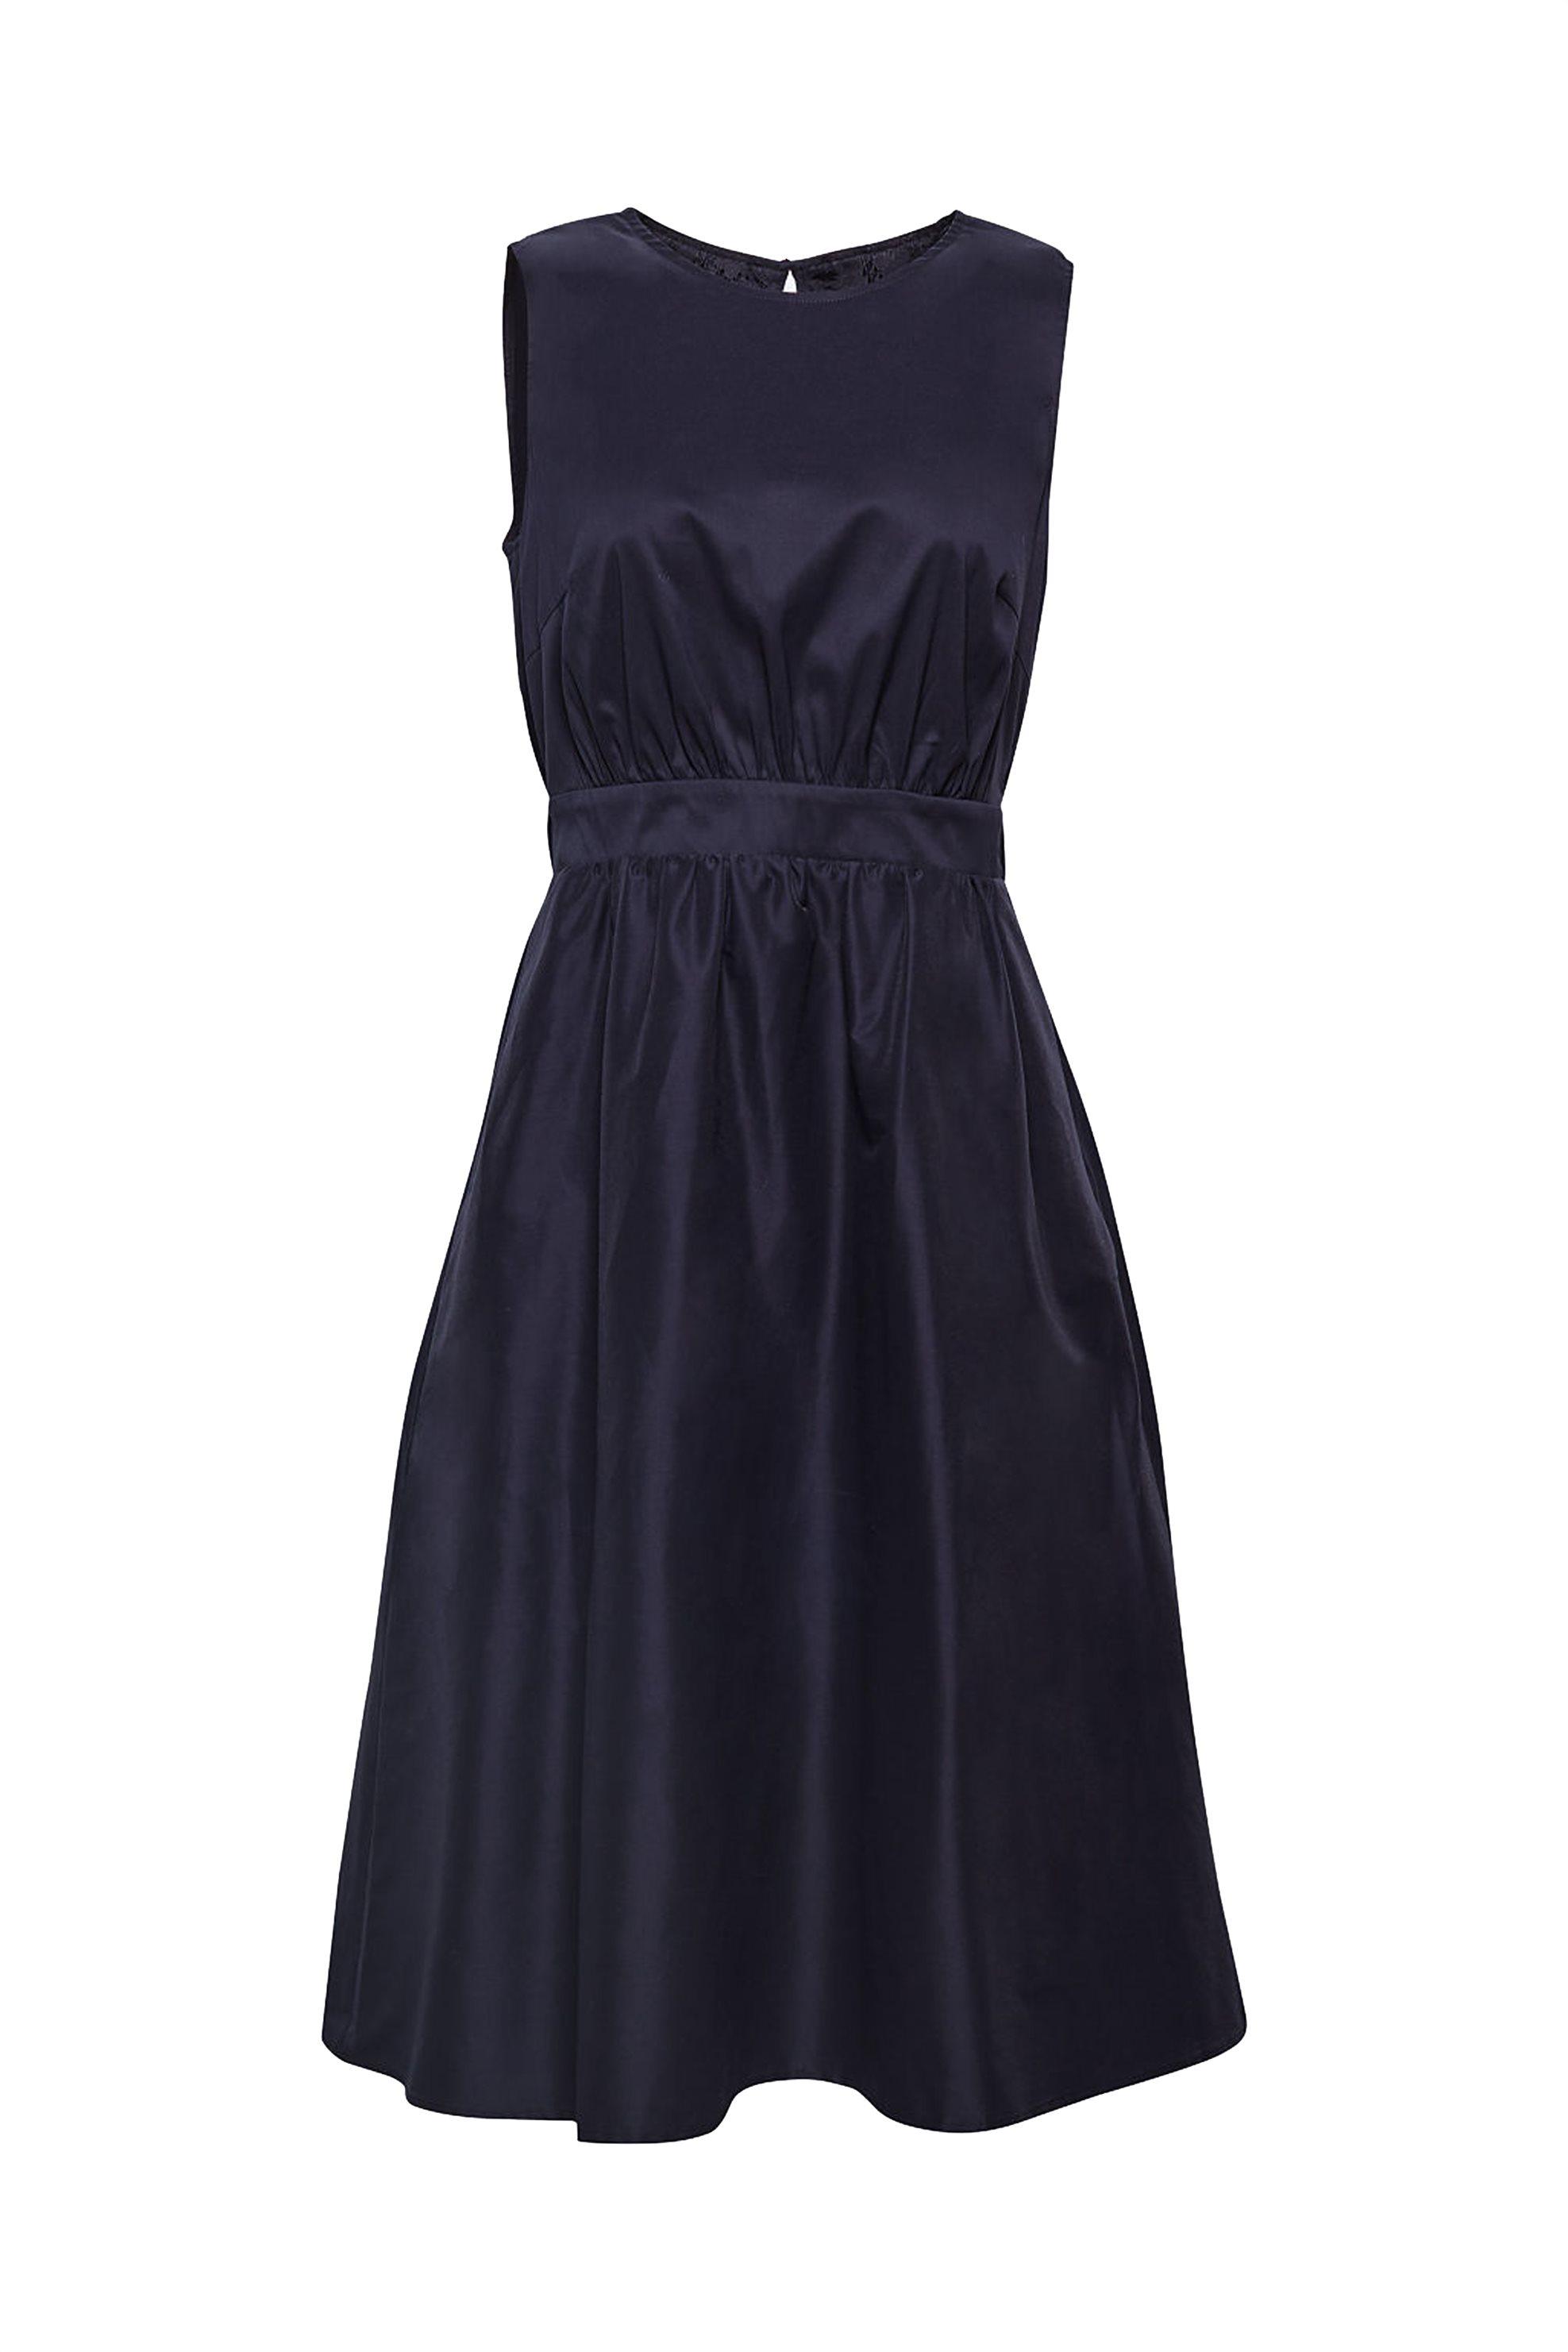 Esprit γυναικείο φόρεμα με δαντέλα πλάτη - 078EO1E013 - Μπλε Σκούρο γυναικα   ρουχα   φορέματα   midi φορέματα